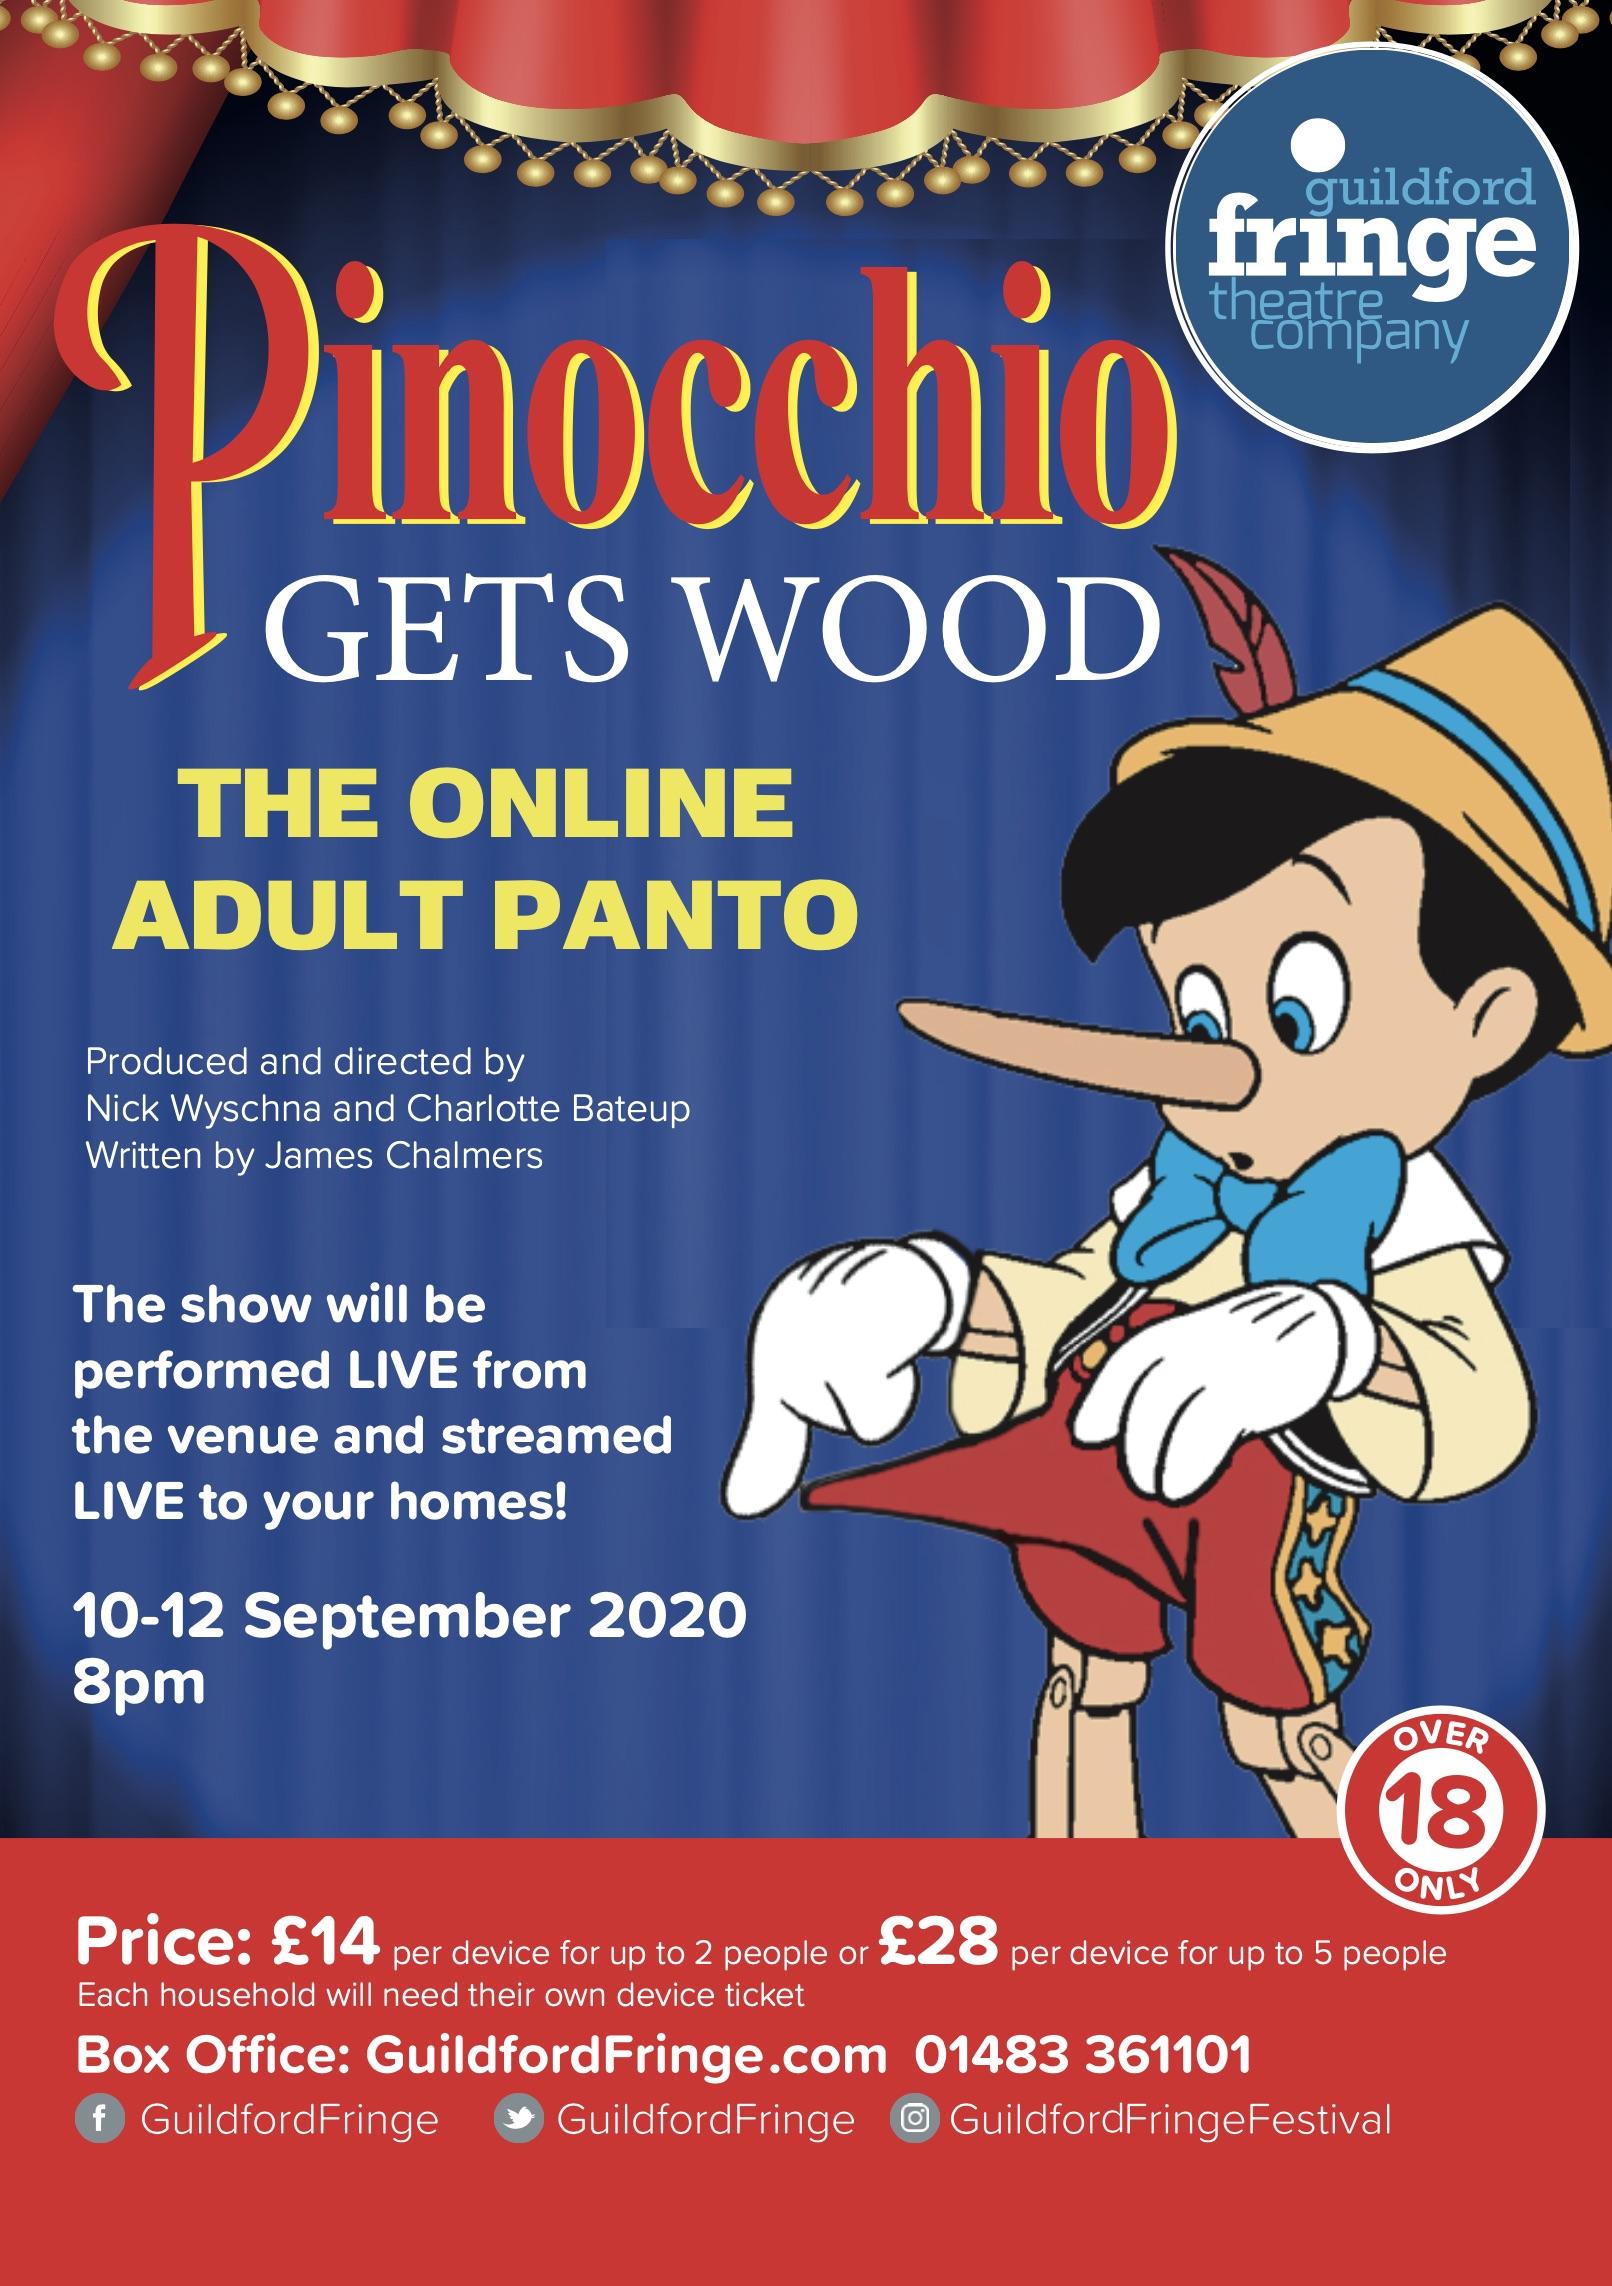 Pinocchio Gets Wood Online Adult Panto Guildford Fringe